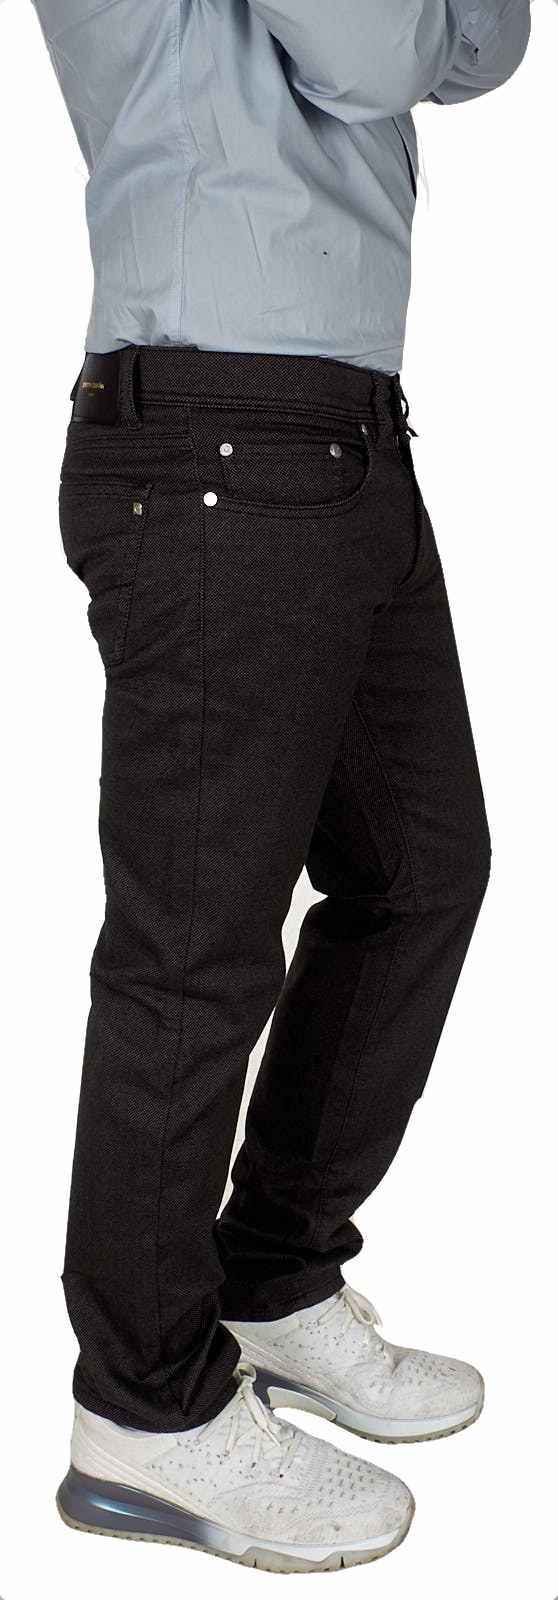 Pierre-Cardin-Jeans-Herren-Hose-Lyon-Chino-Modern-Fit-Slim-Leg-30917-4731-85 Indexbild 3